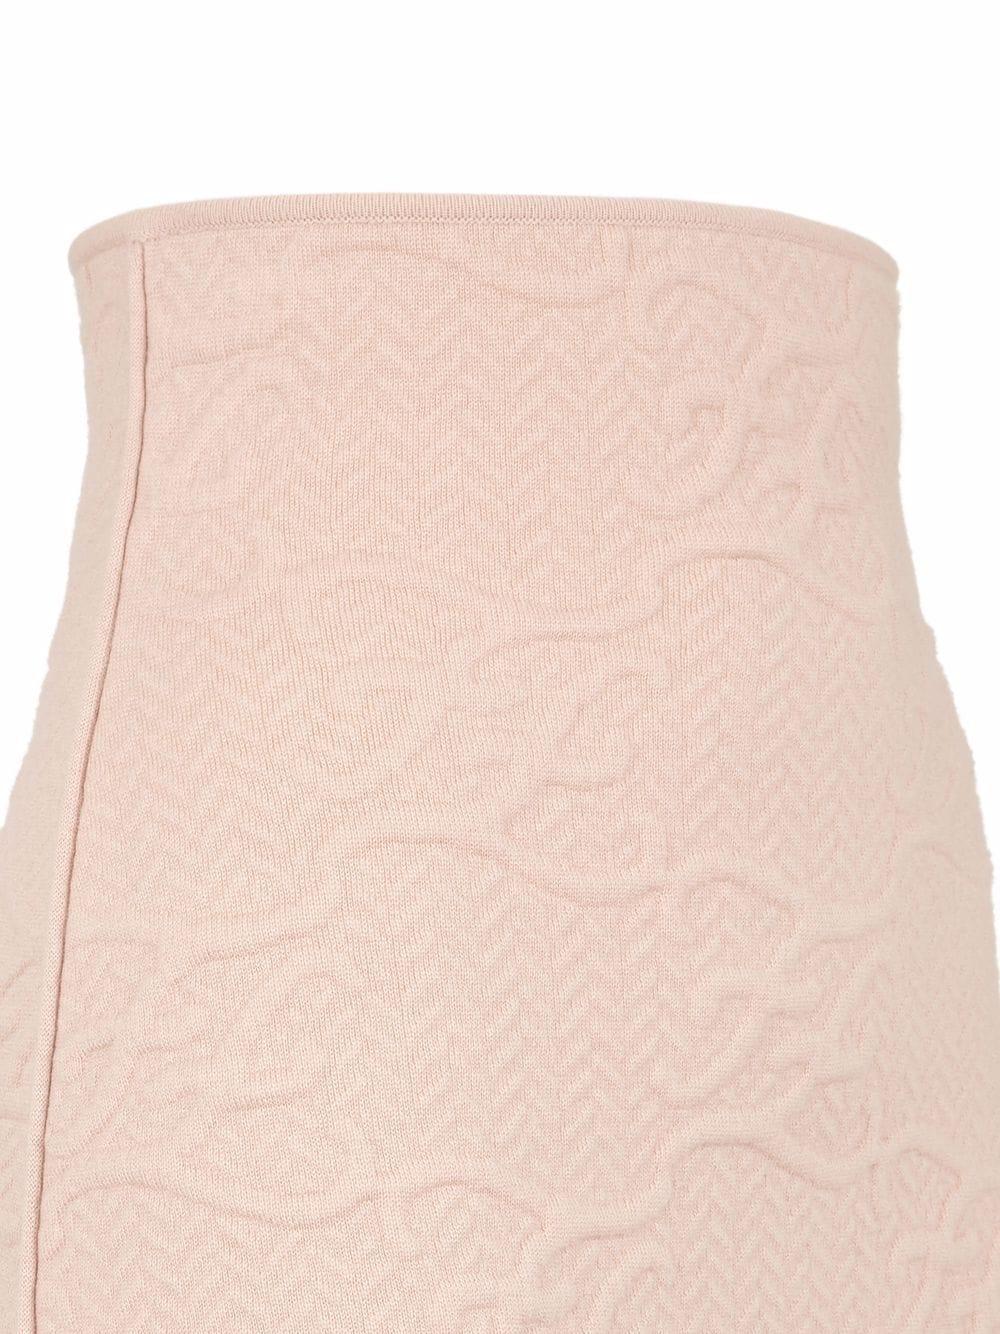 Pink FF Karligraphy pencil skirt  FENDI |  | FZQ646-AHE9F1ENM